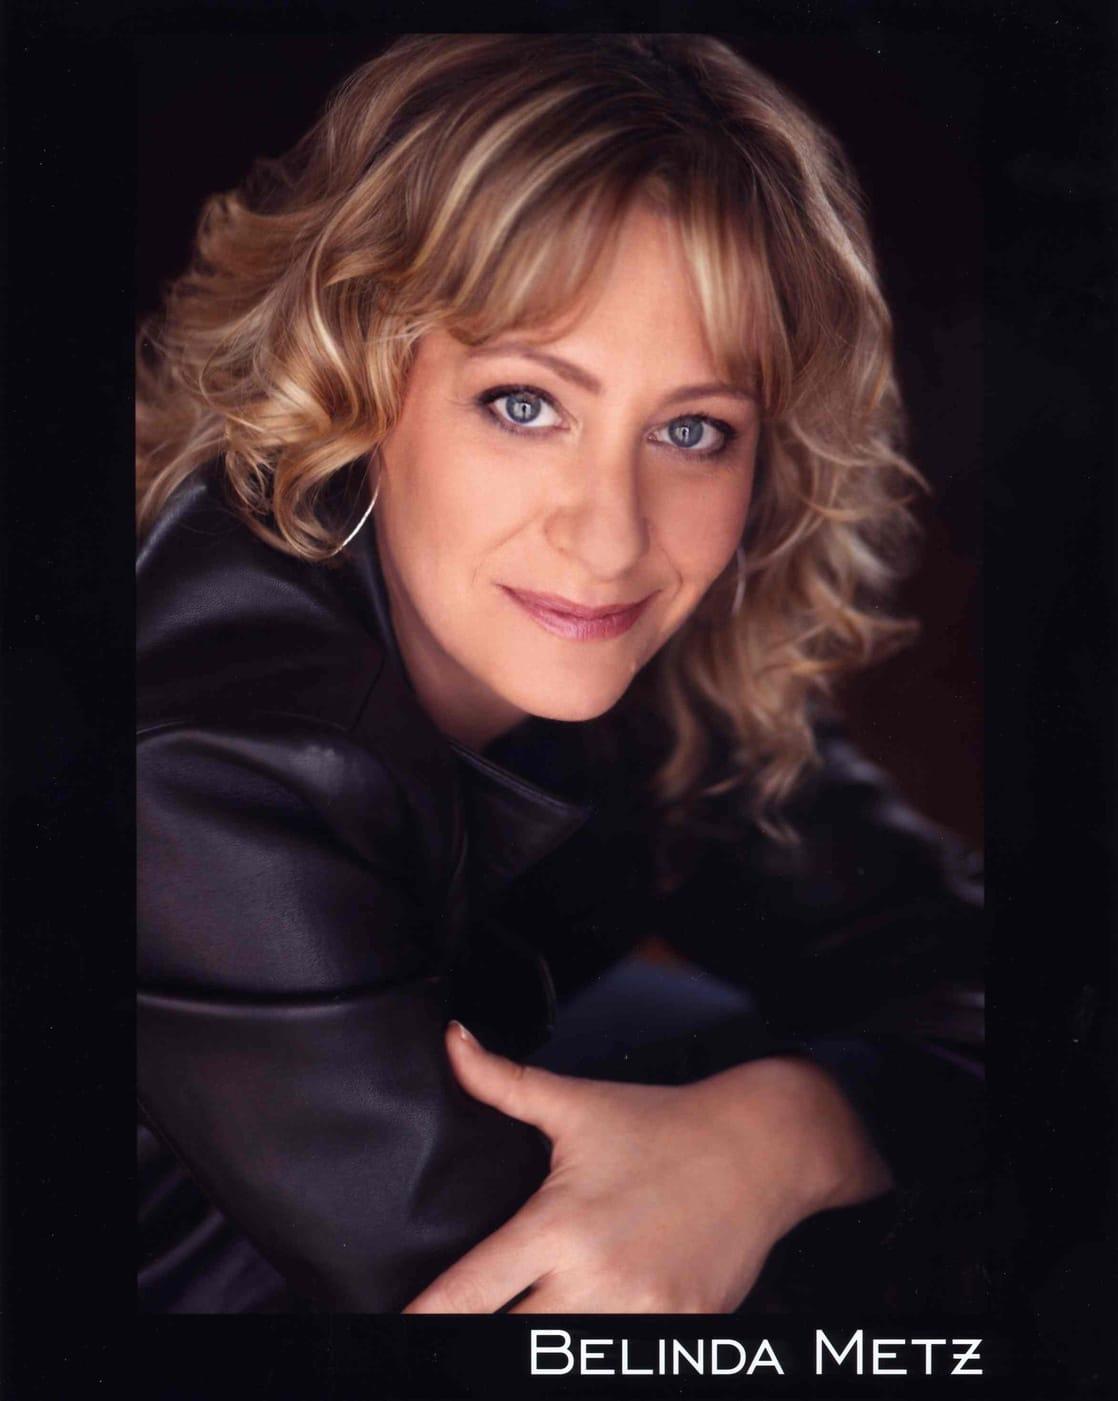 Belinda Metz